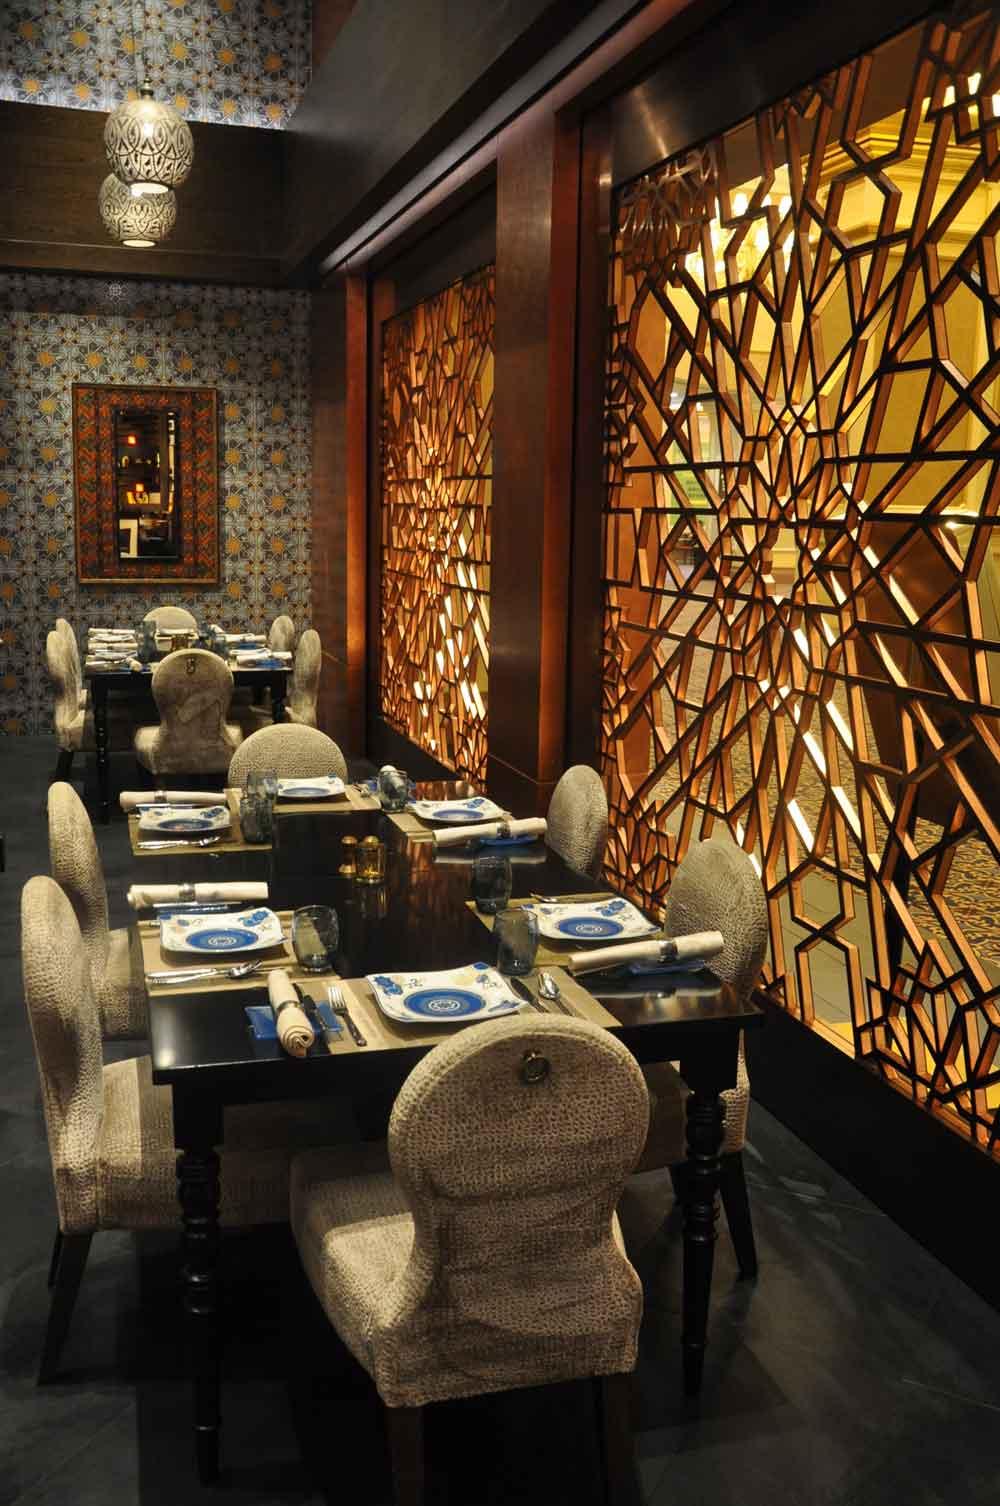 Golden Peacock Macau tables and lattice window